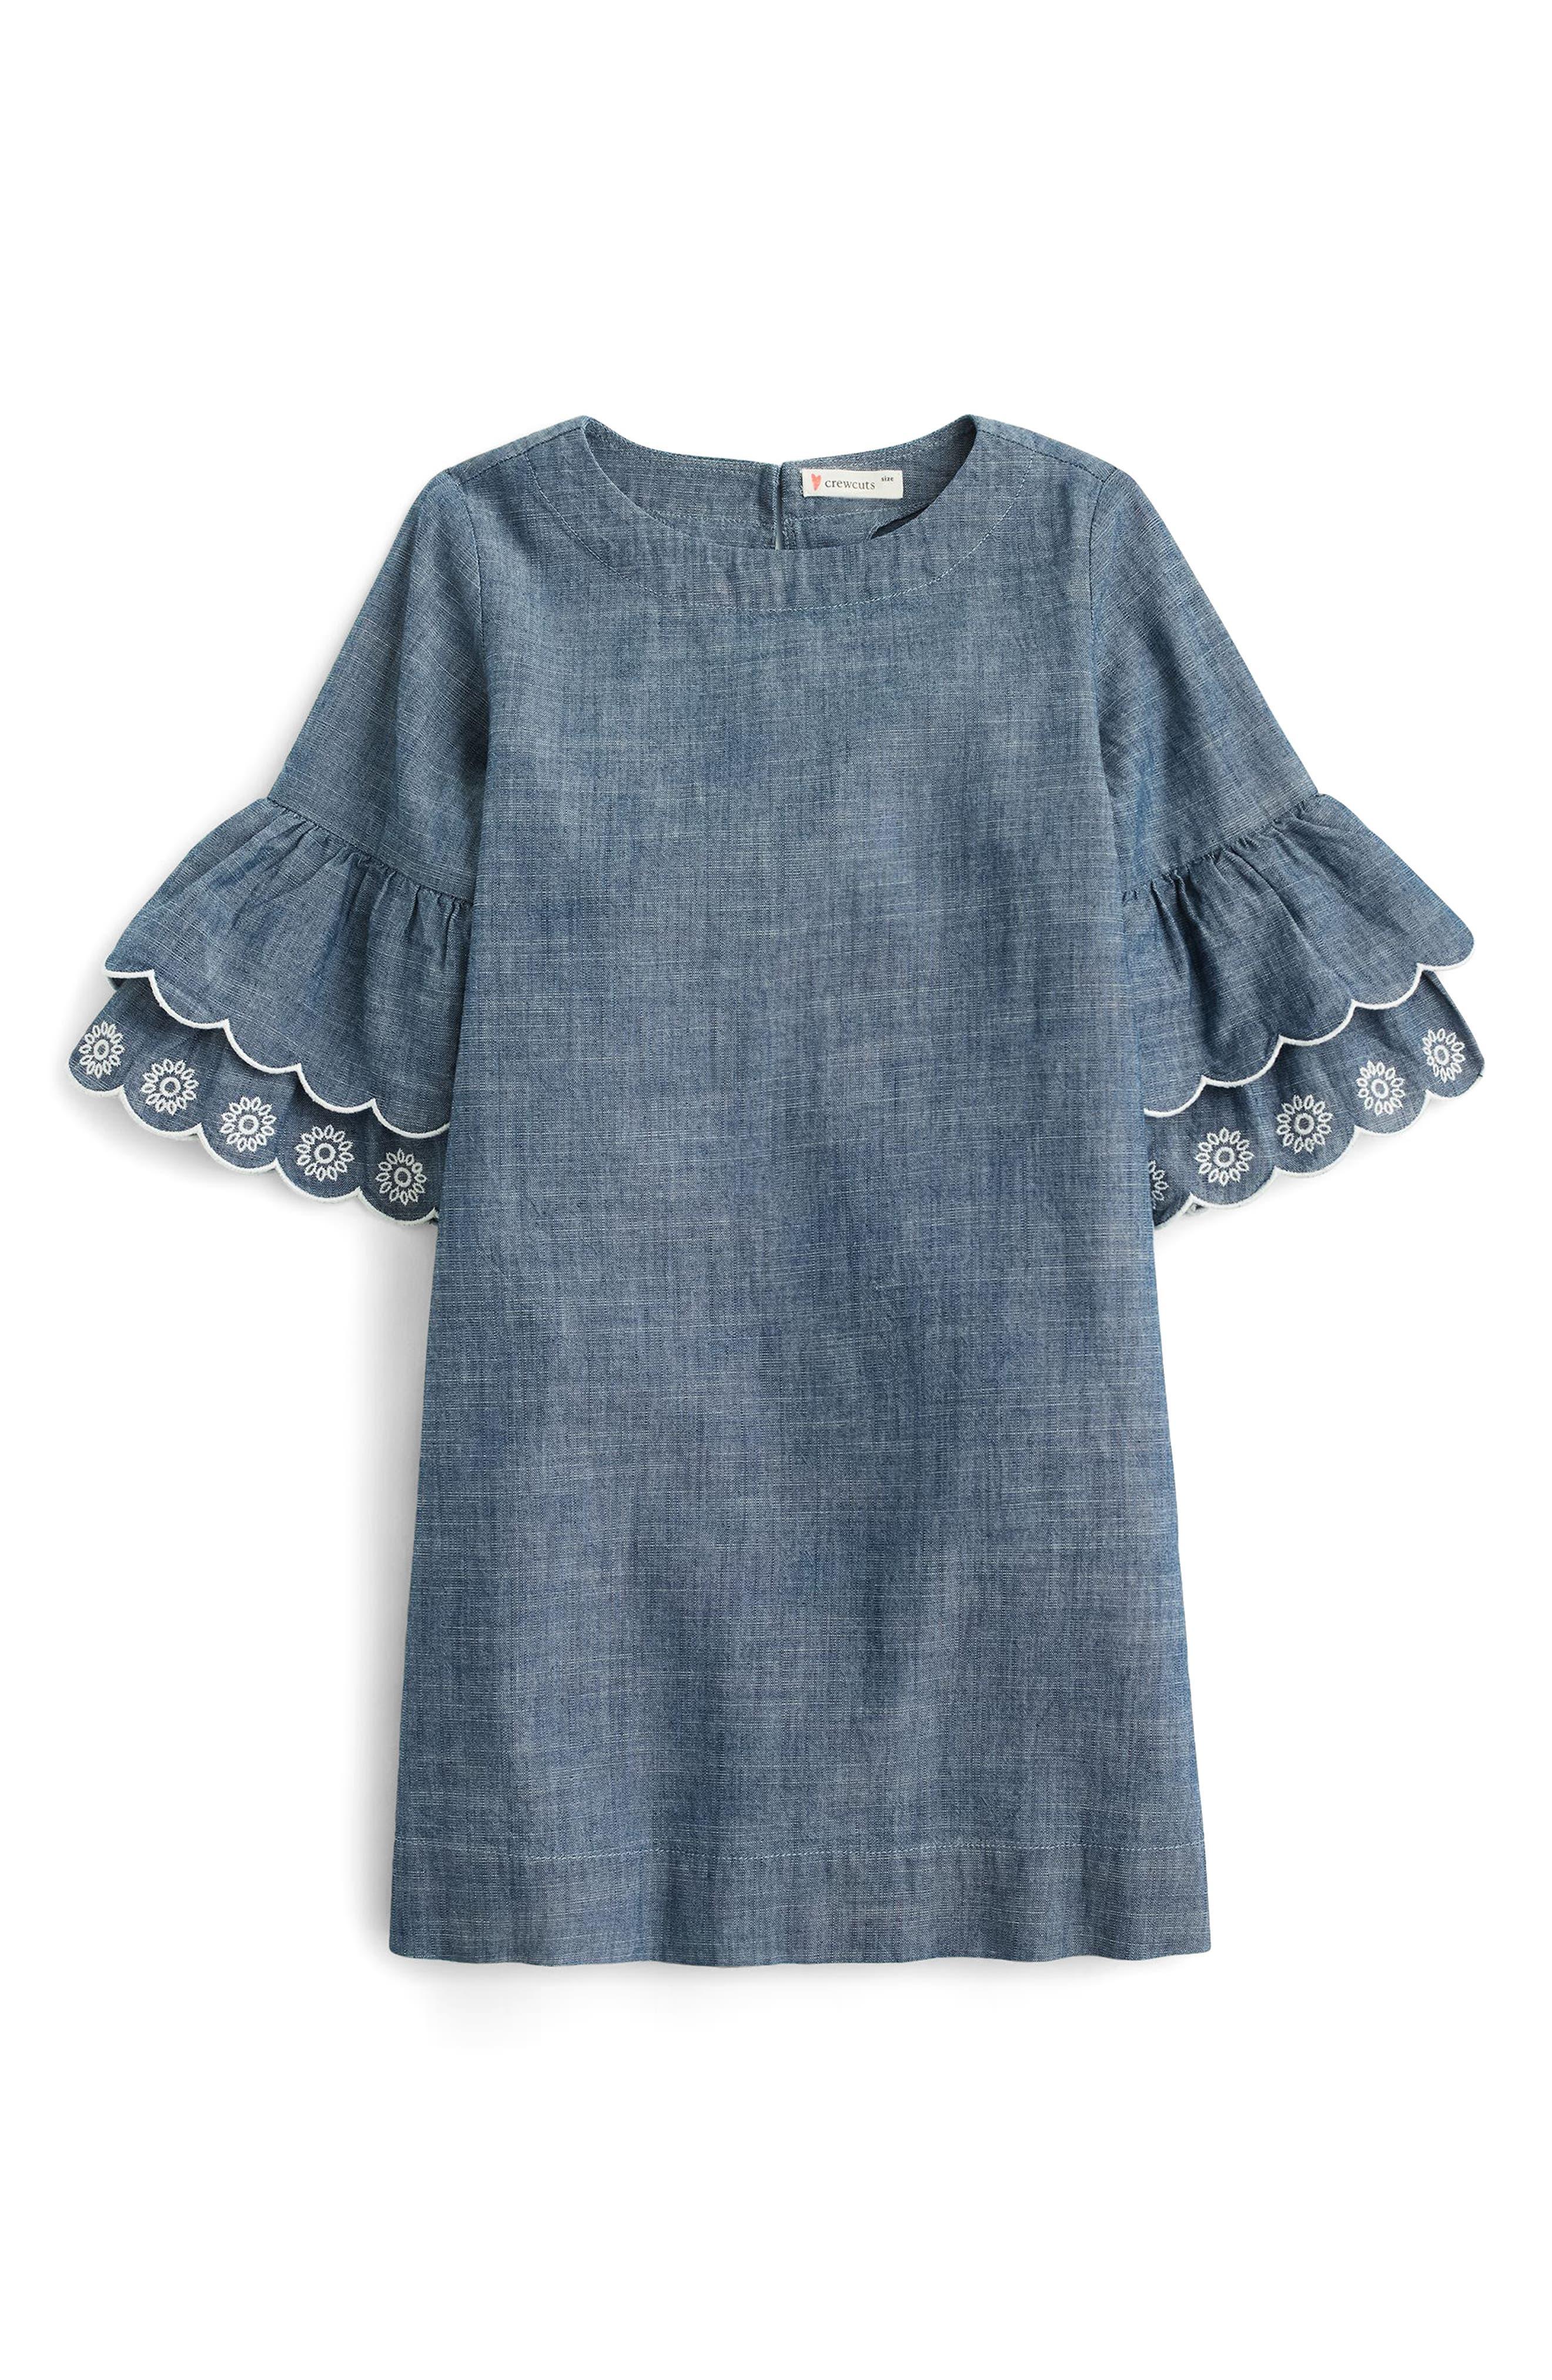 crewcuts by J.Crew Chambray Ruffle Sleeve Dress (Toddler Girls, Little Girls & Big Girls)